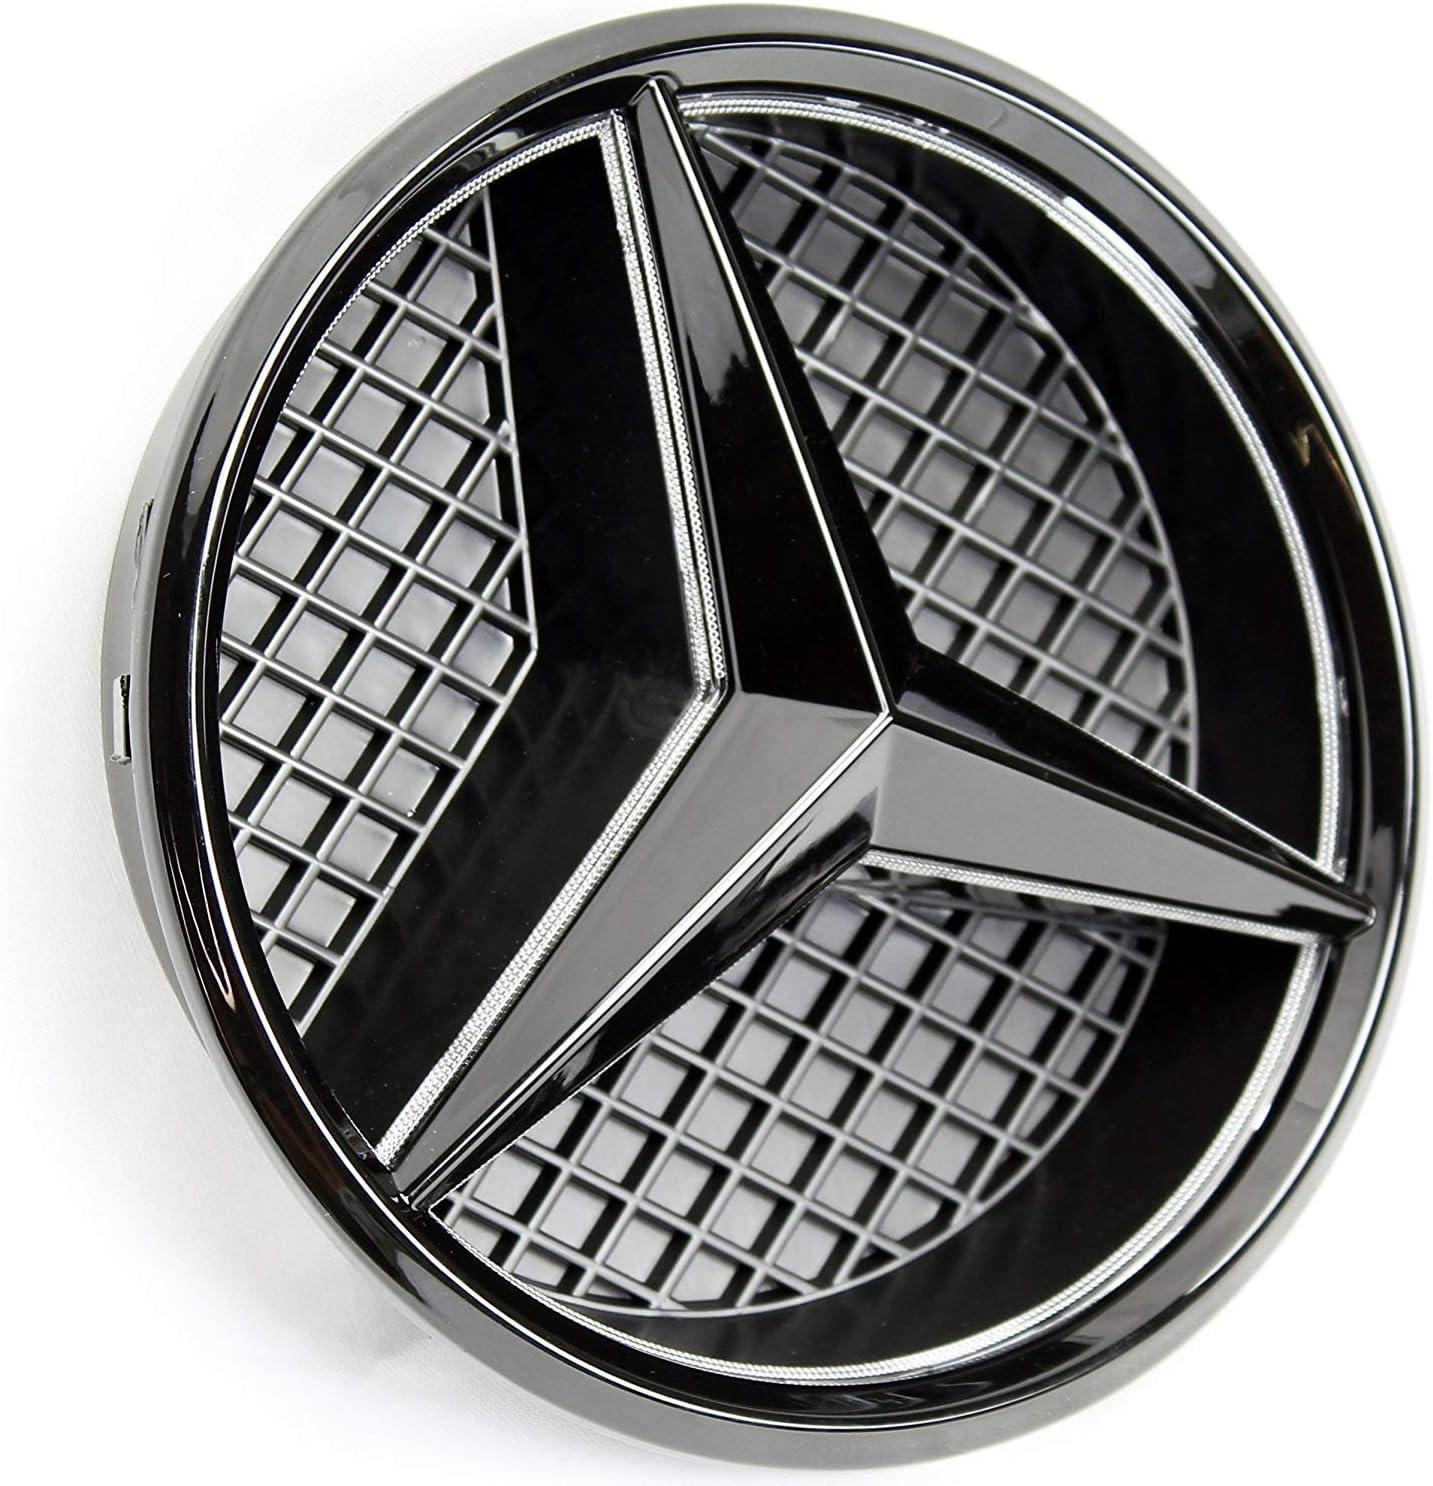 IHEX Auto Xenon White Illuminated LED Car Logo Grid Badge for Mercedes Benz A//B//C//CLS//E//GLK//GL//R Series Front Grille LED Emblem Light